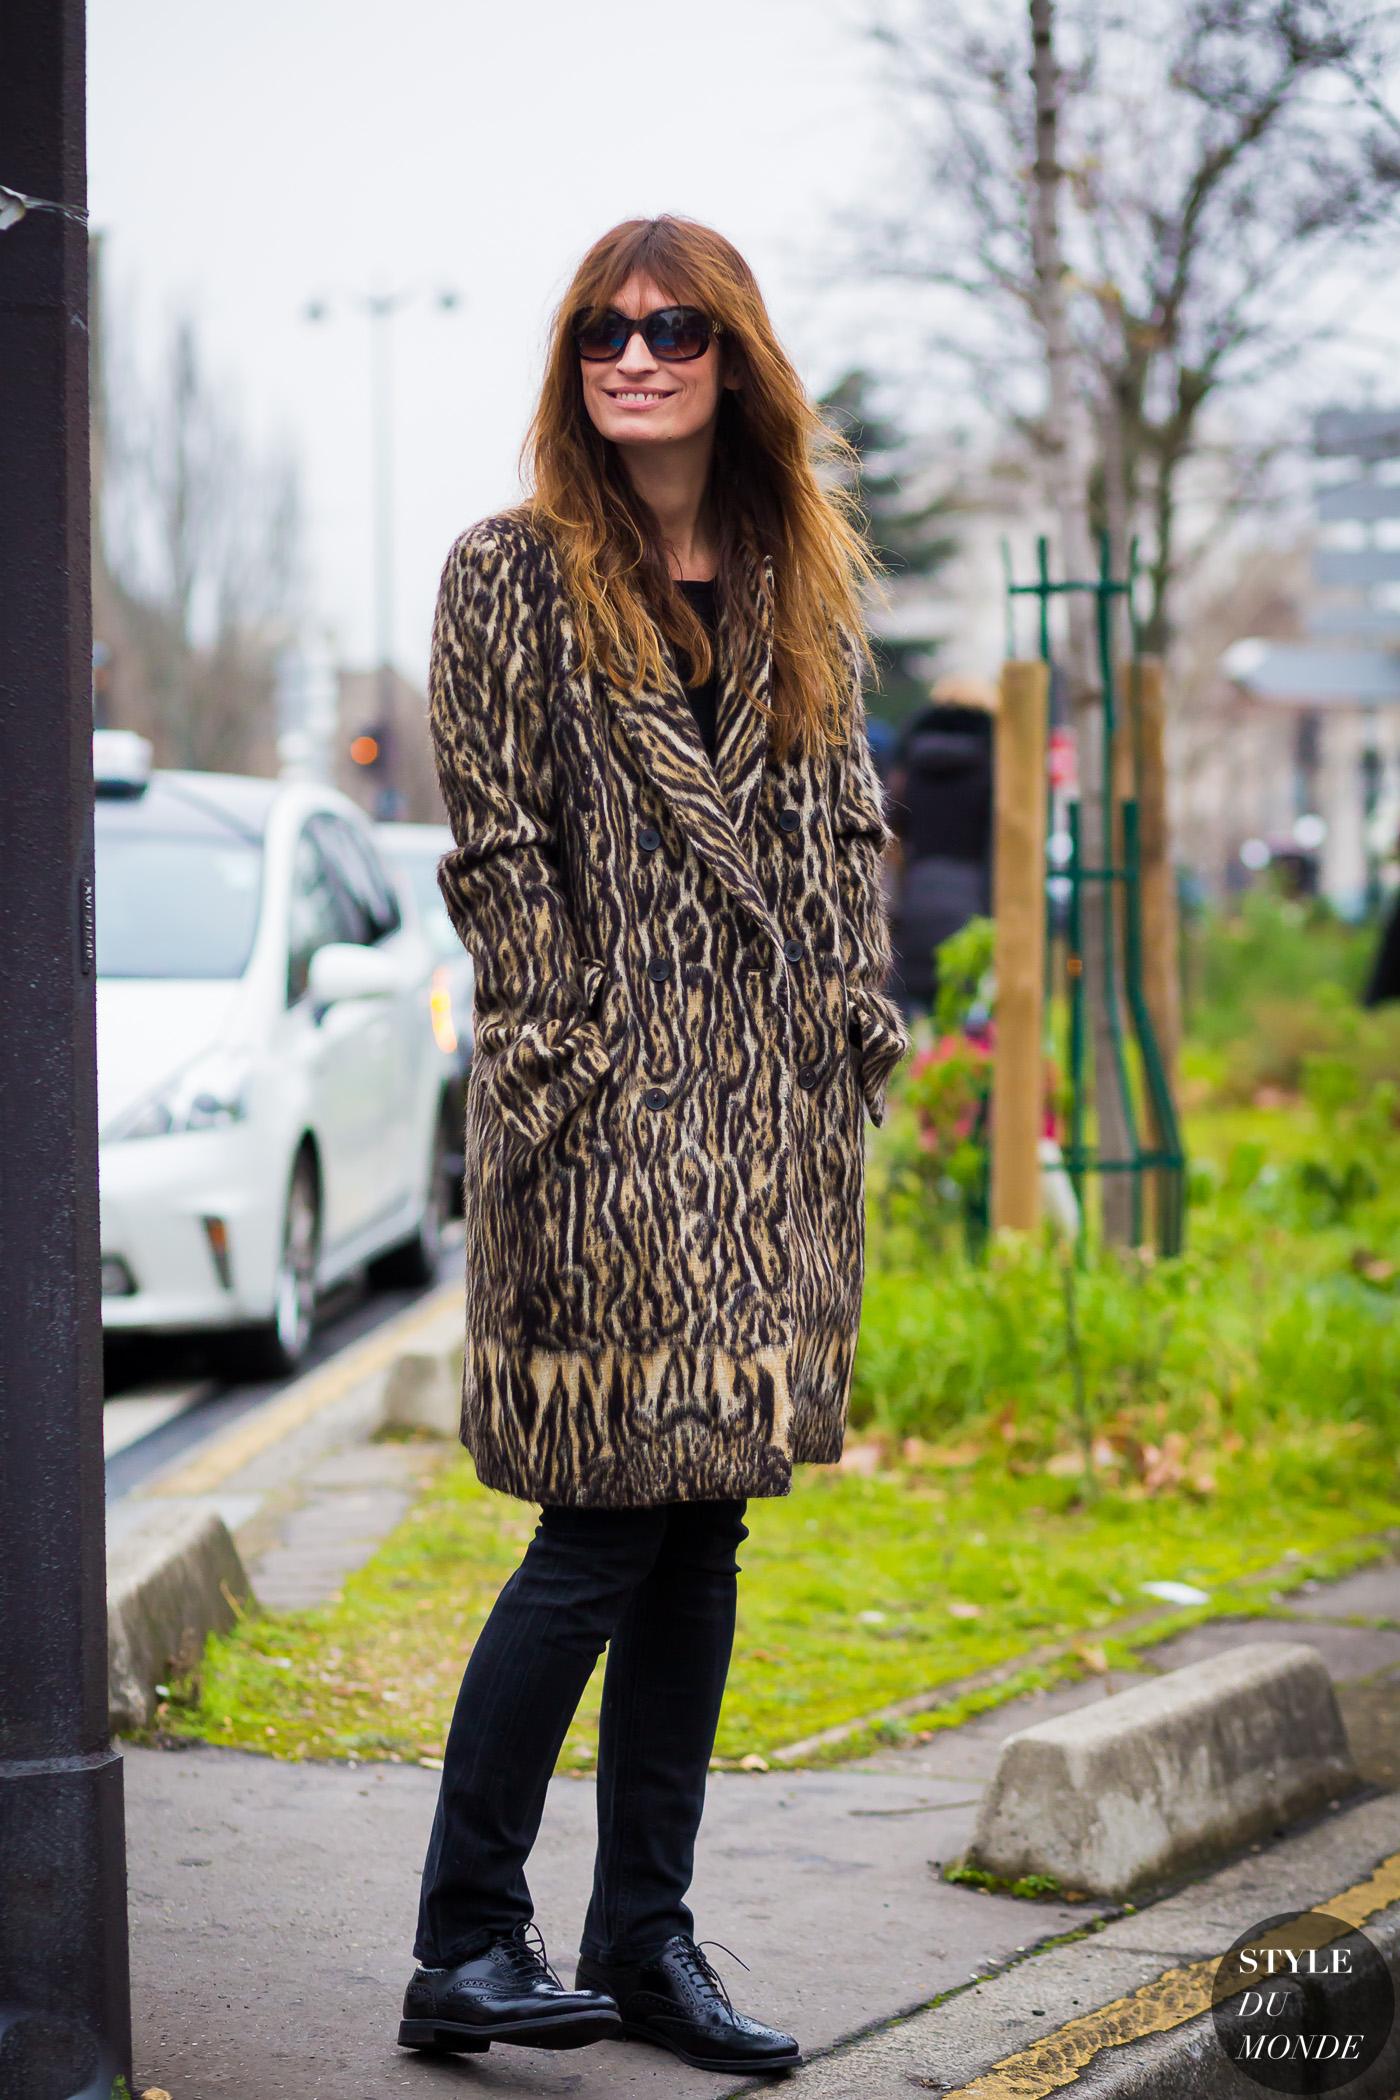 Paris Men 39 S Fashion Week Fw 2016 Street Style Caroline De Maigret Style Du Monde Street